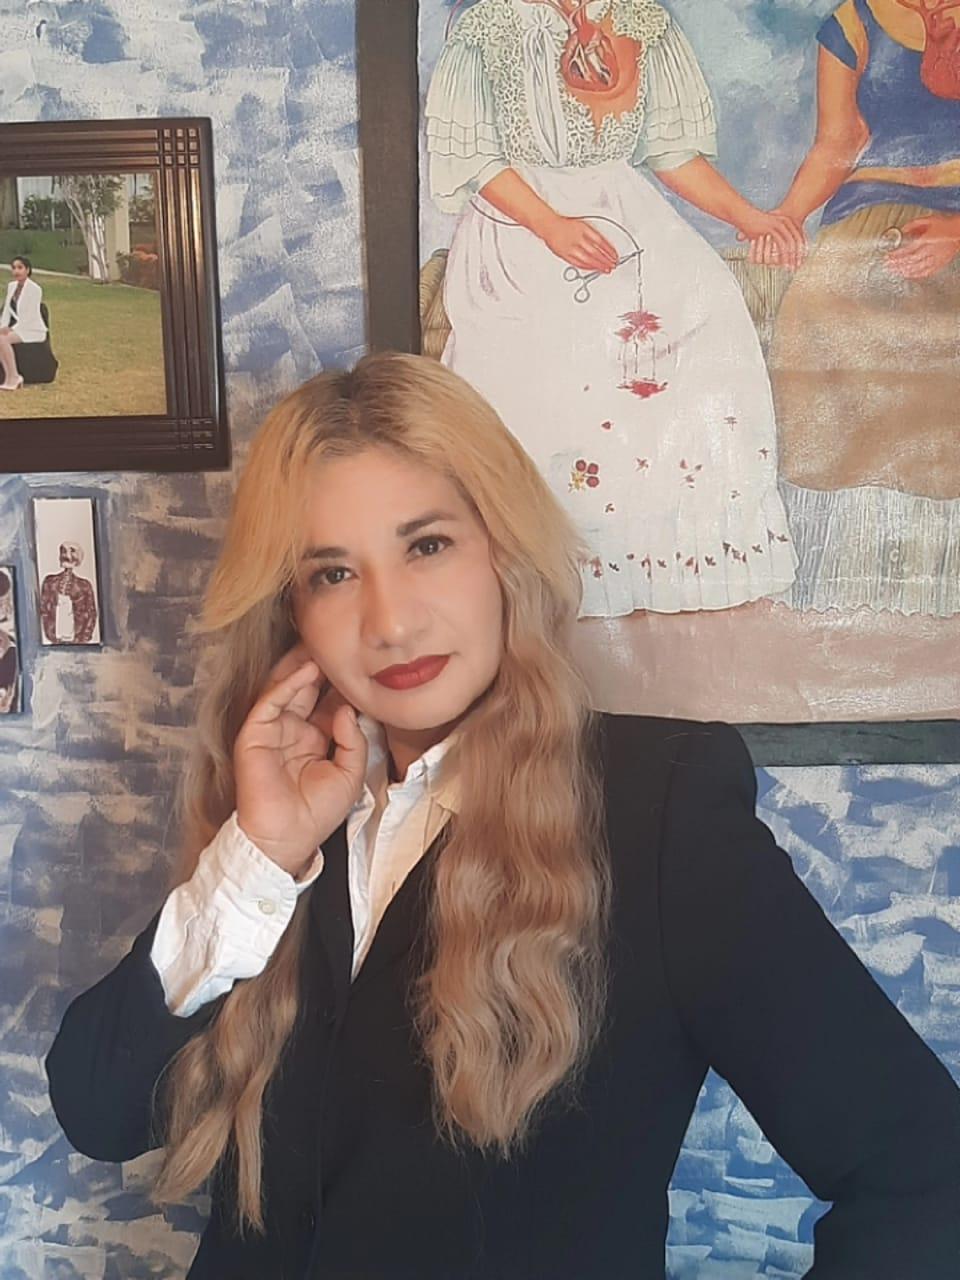 Yadira Magaña Montero